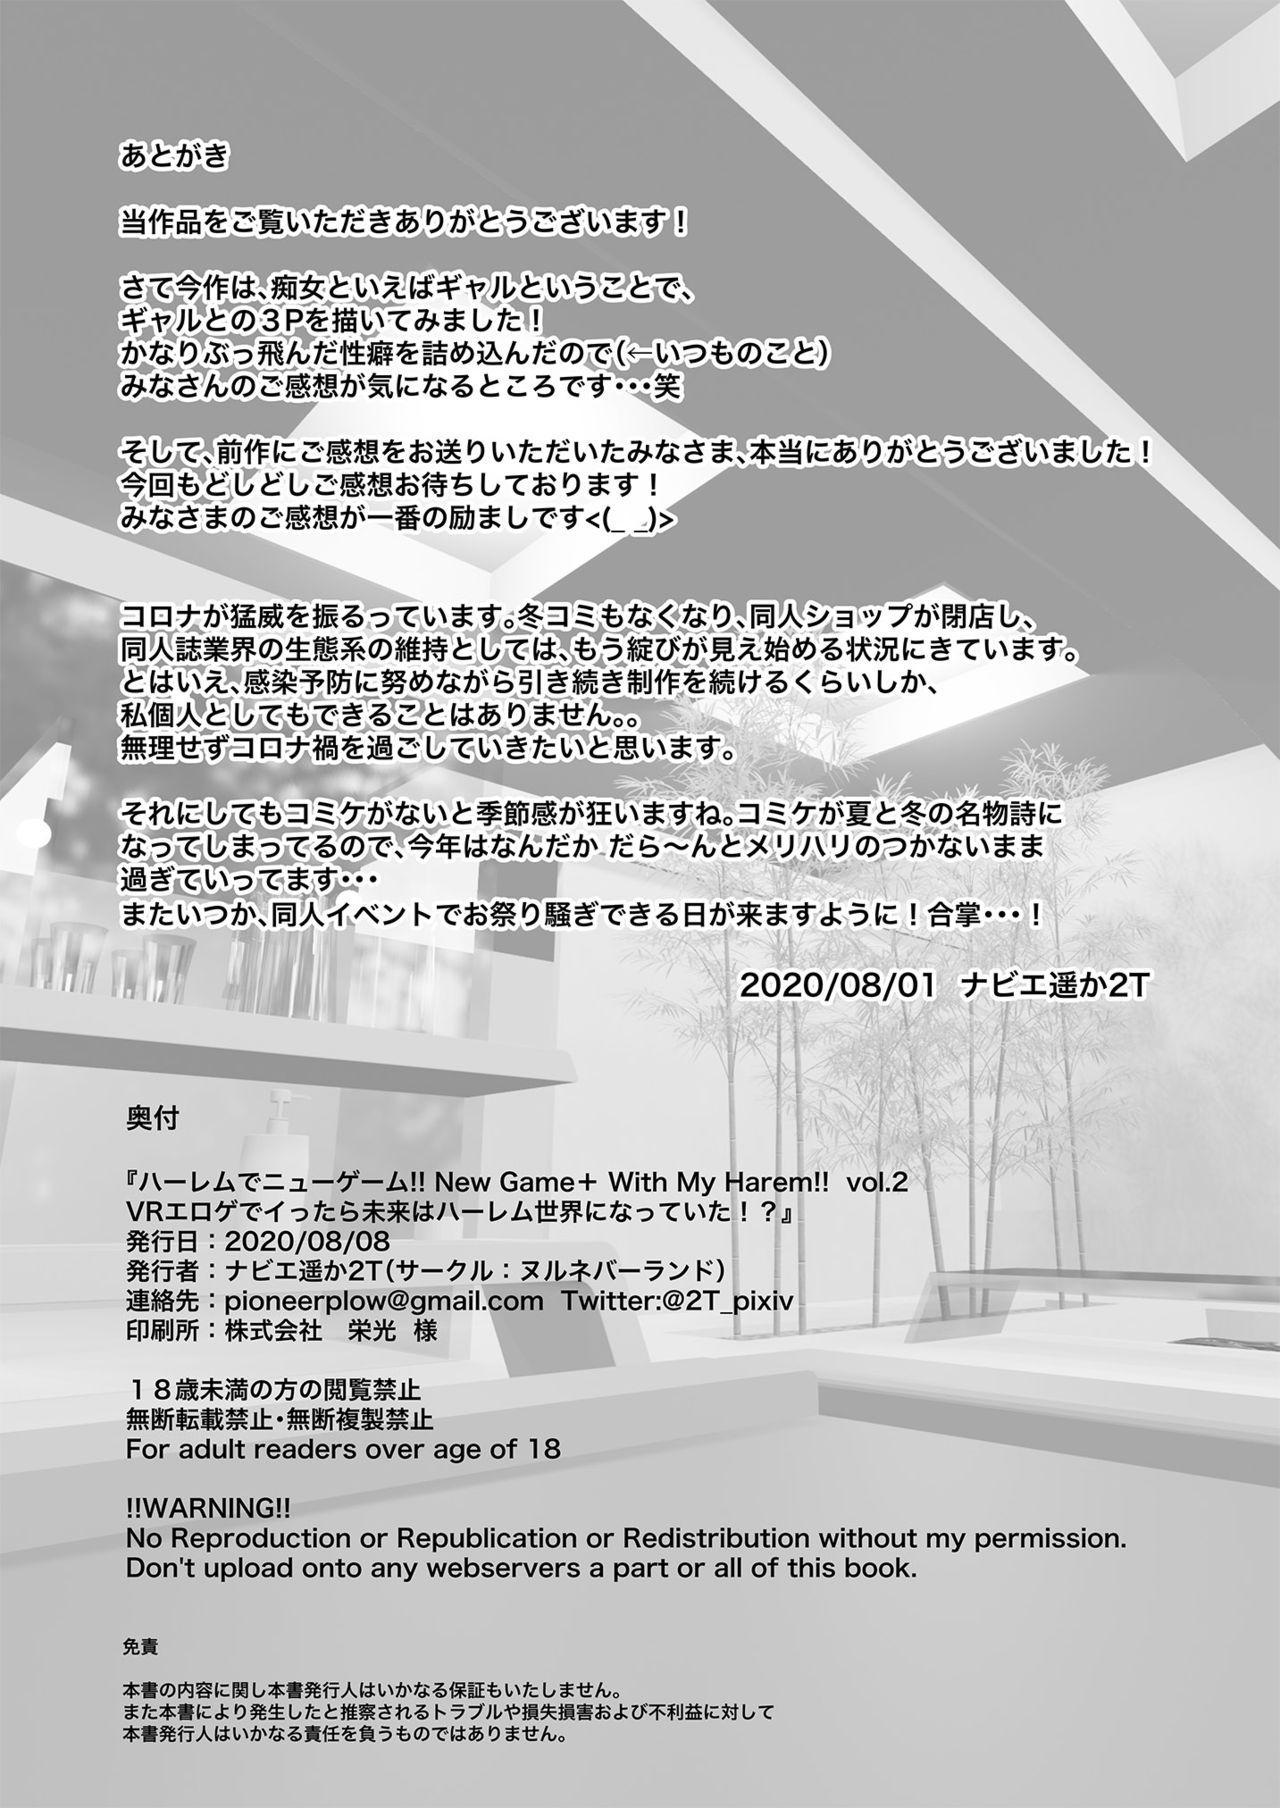 Harem de NEWGAME+!! vol.2 ~VR Eroge de Ittara Mirai wa Harem Sekai ni Natte Ita!? - New Game With My Harem!! 32